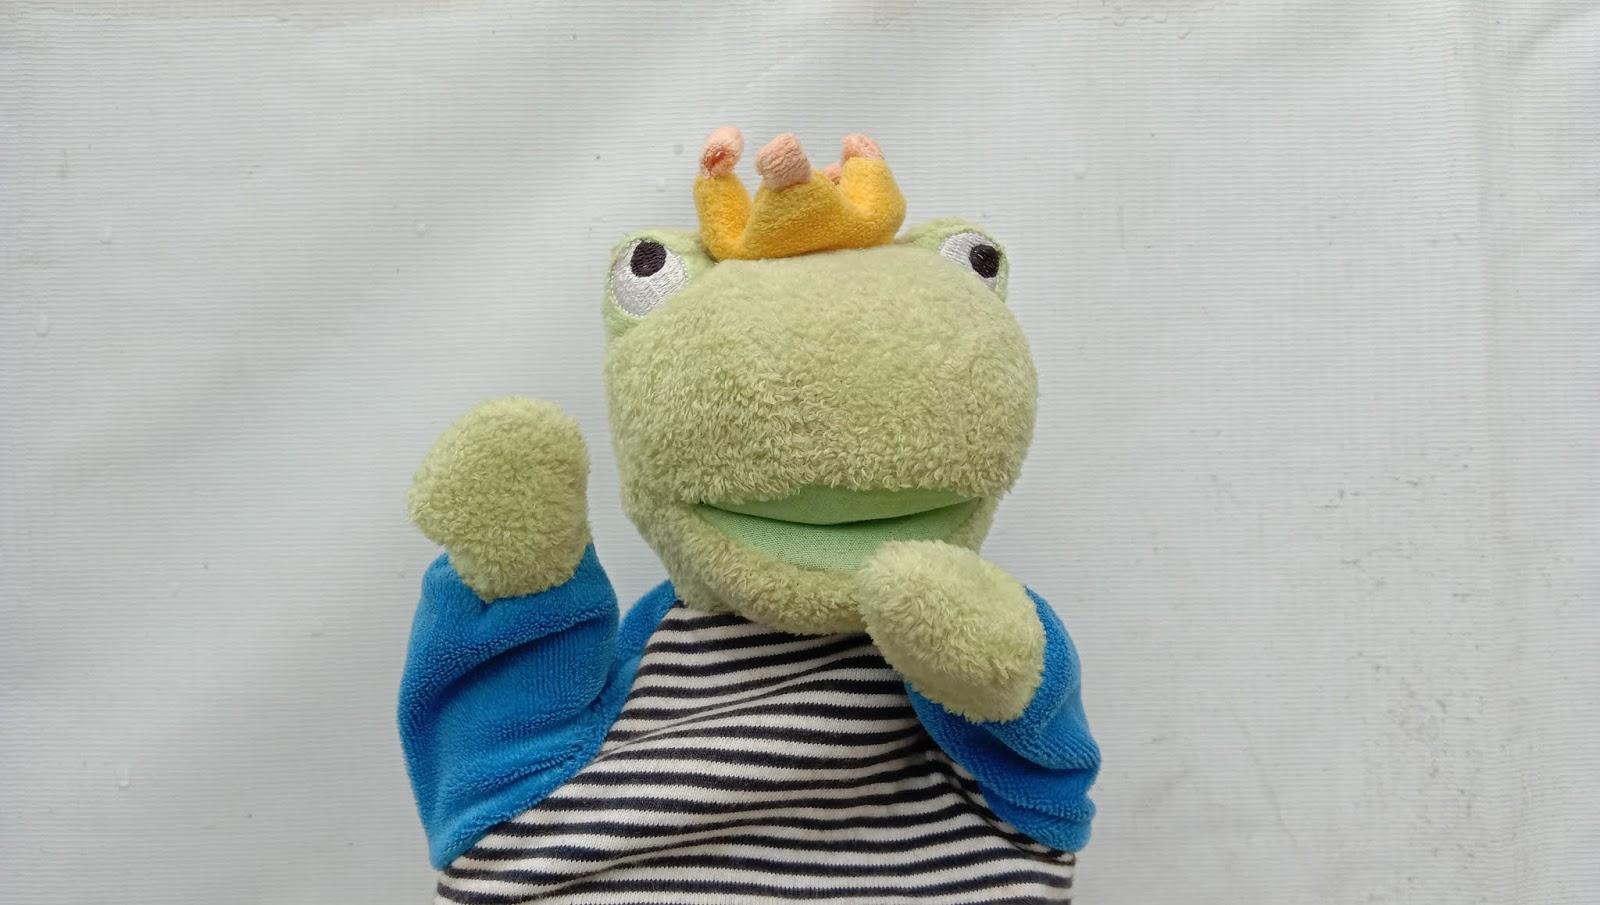 Raja Kodok